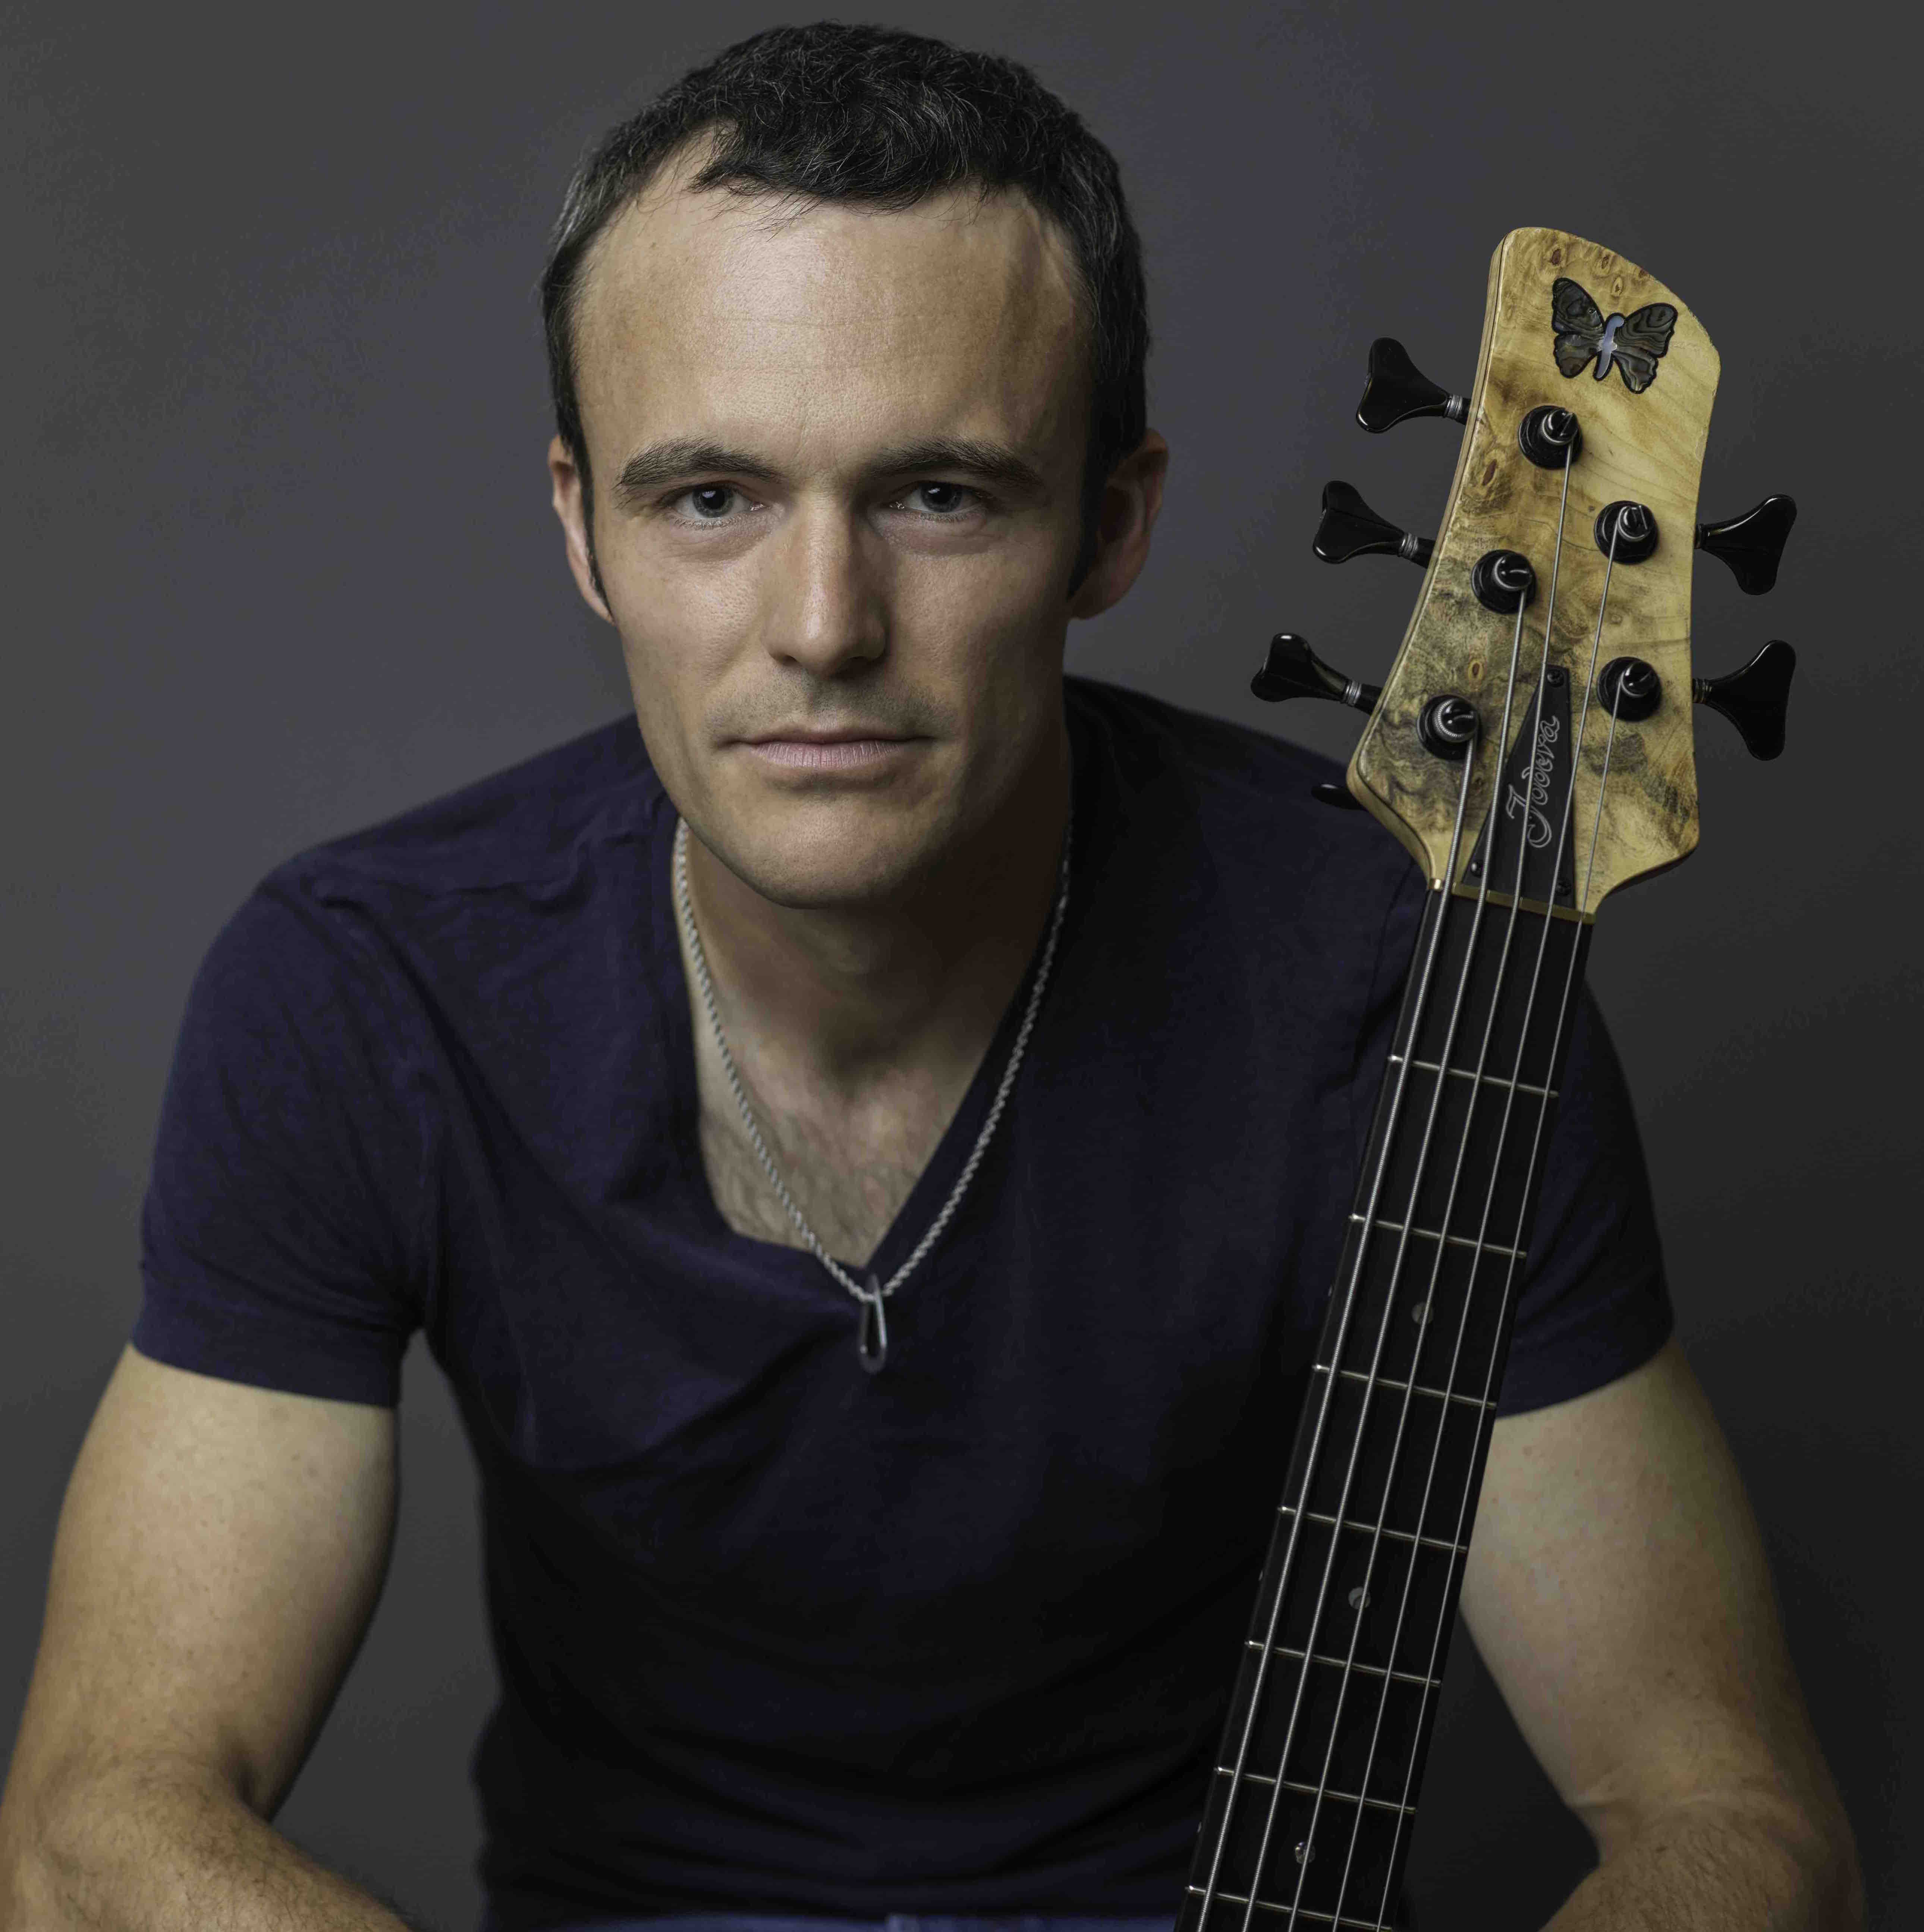 Glasgow Jazz Festival: Janek Gwizdala - Solo Concert